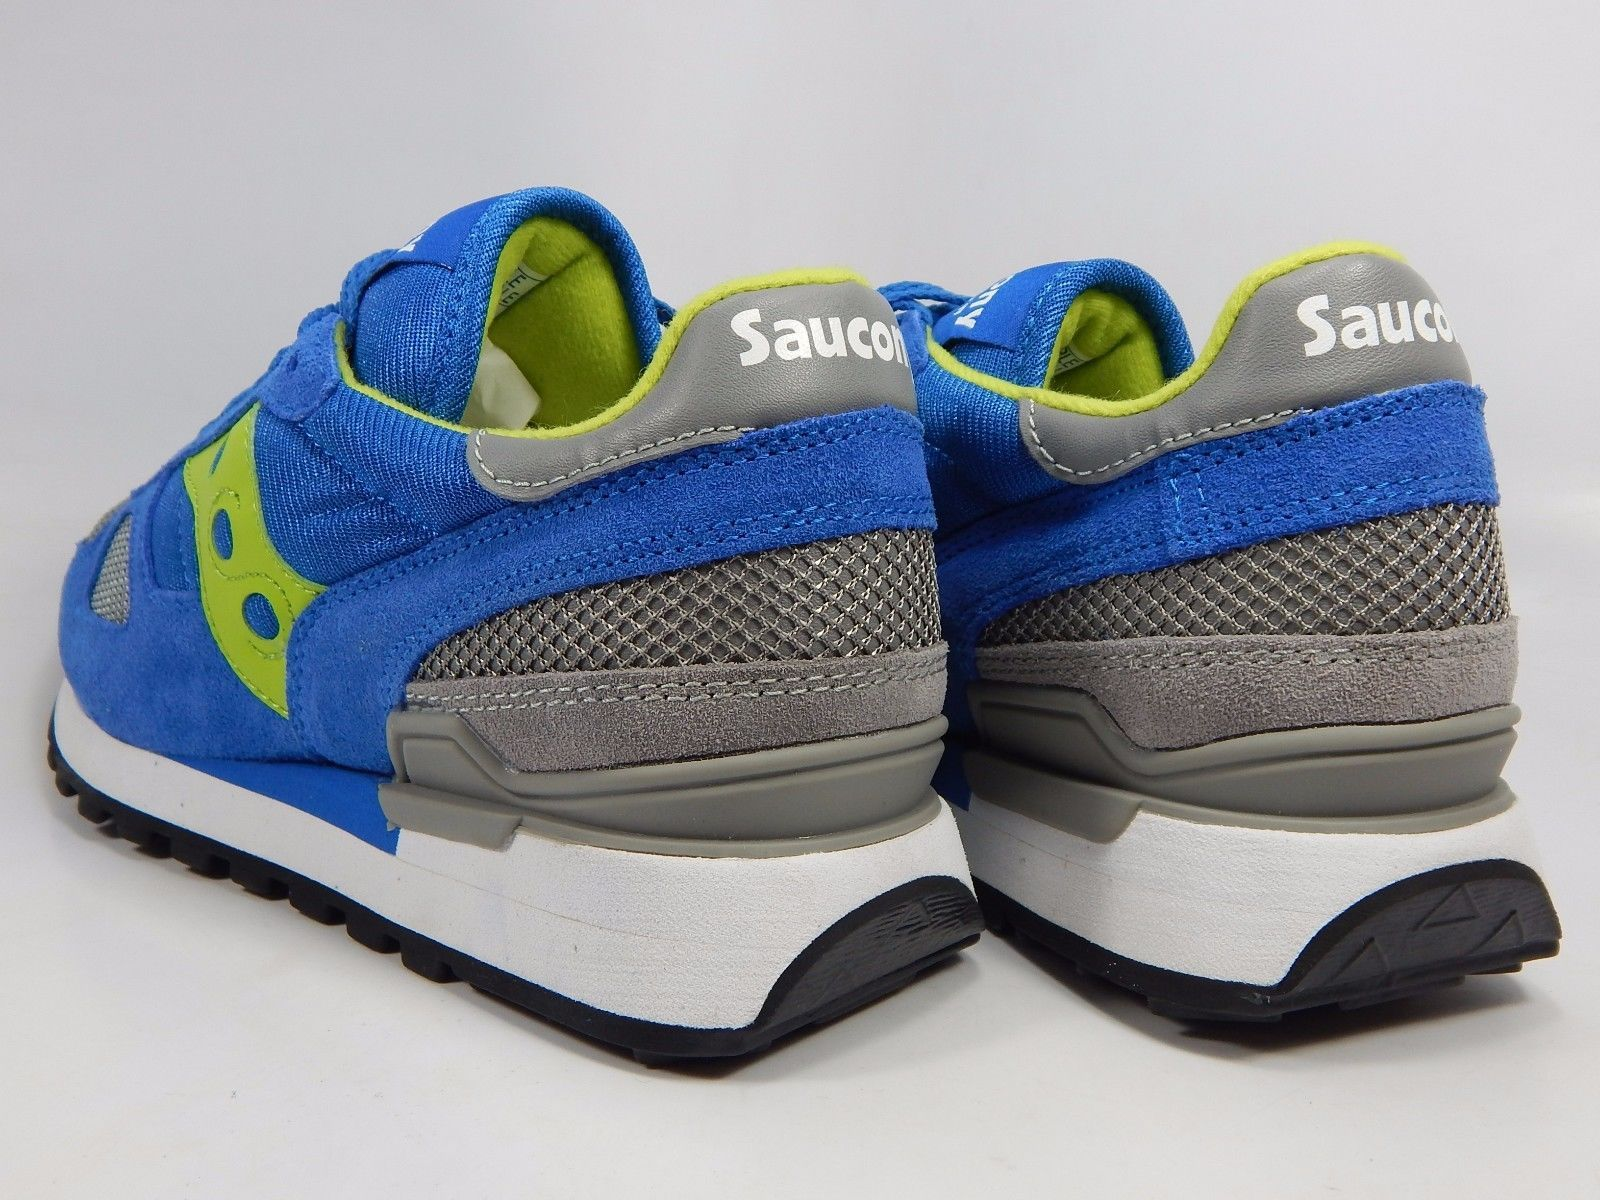 Saucony Shadow Original Men's Running Shoes Sz US 9 M (D) EU 42.5 Blue S2108-585